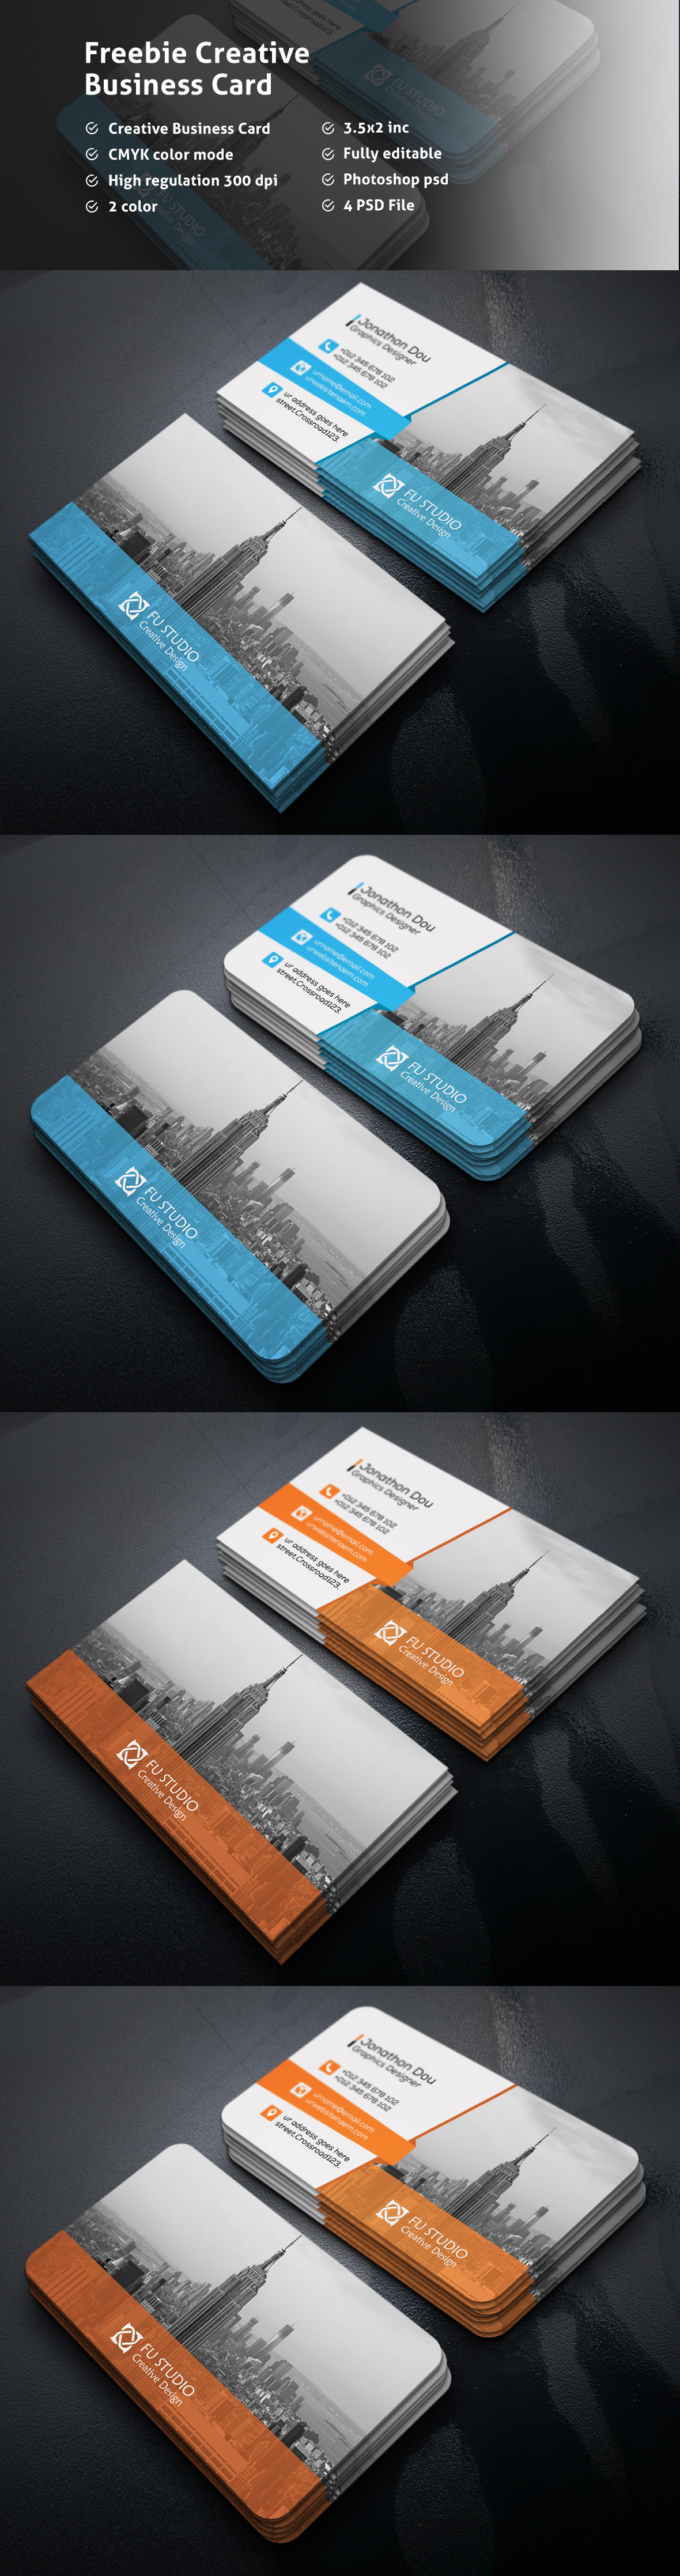 3.5x2 300dpi awesome Beautiful business card CMYK color company cool corporate creative design free Free Card freebie